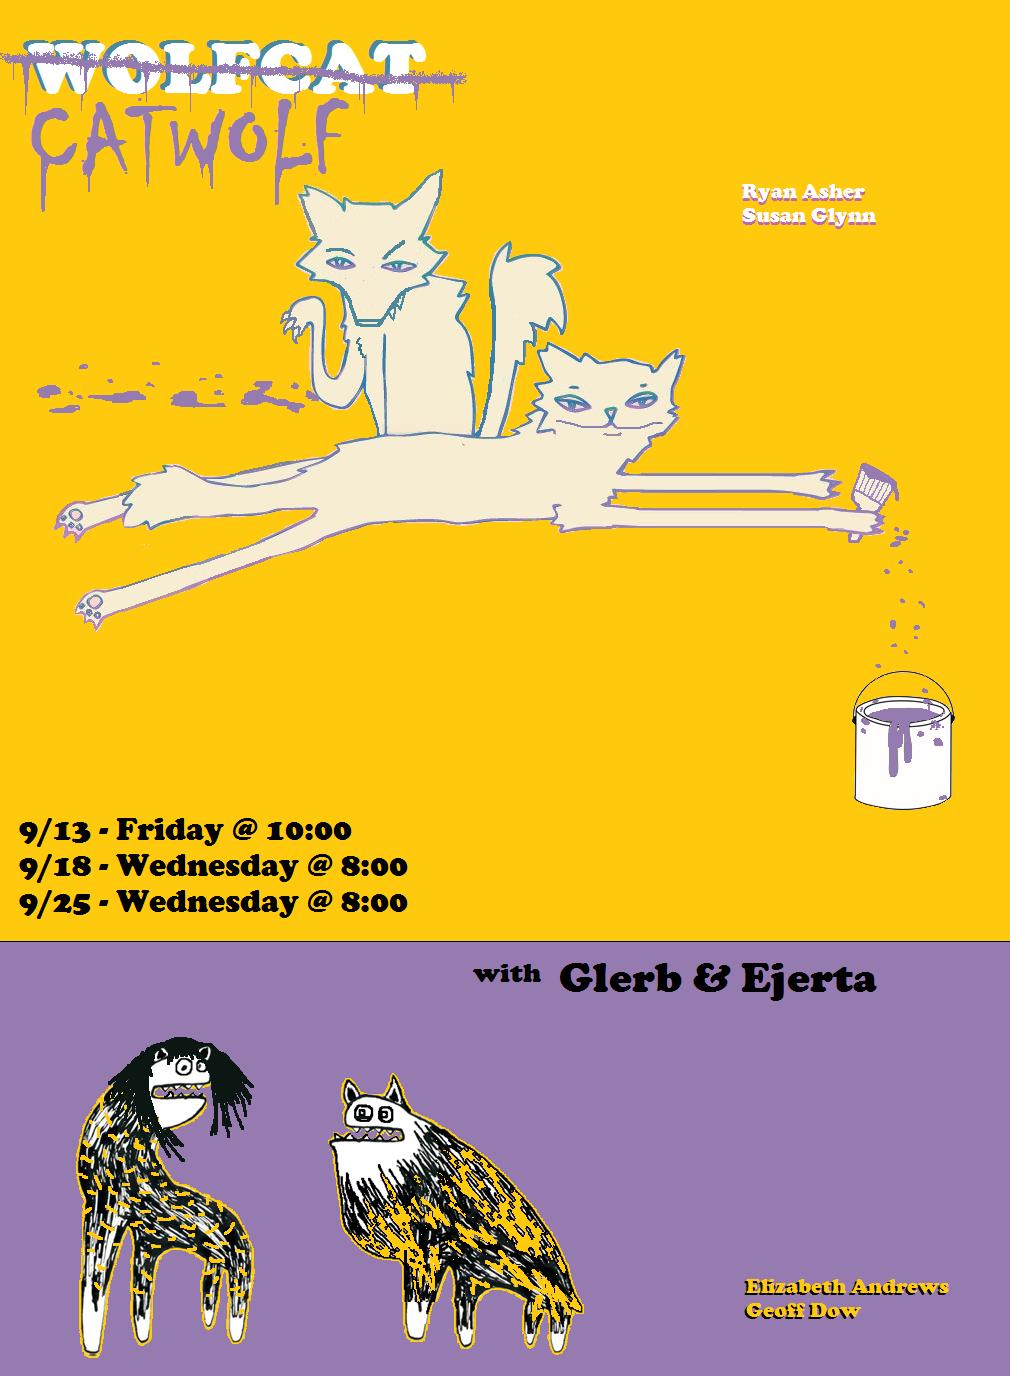 Randy / Glerb & Ejerta / Wolfcat Catwolf